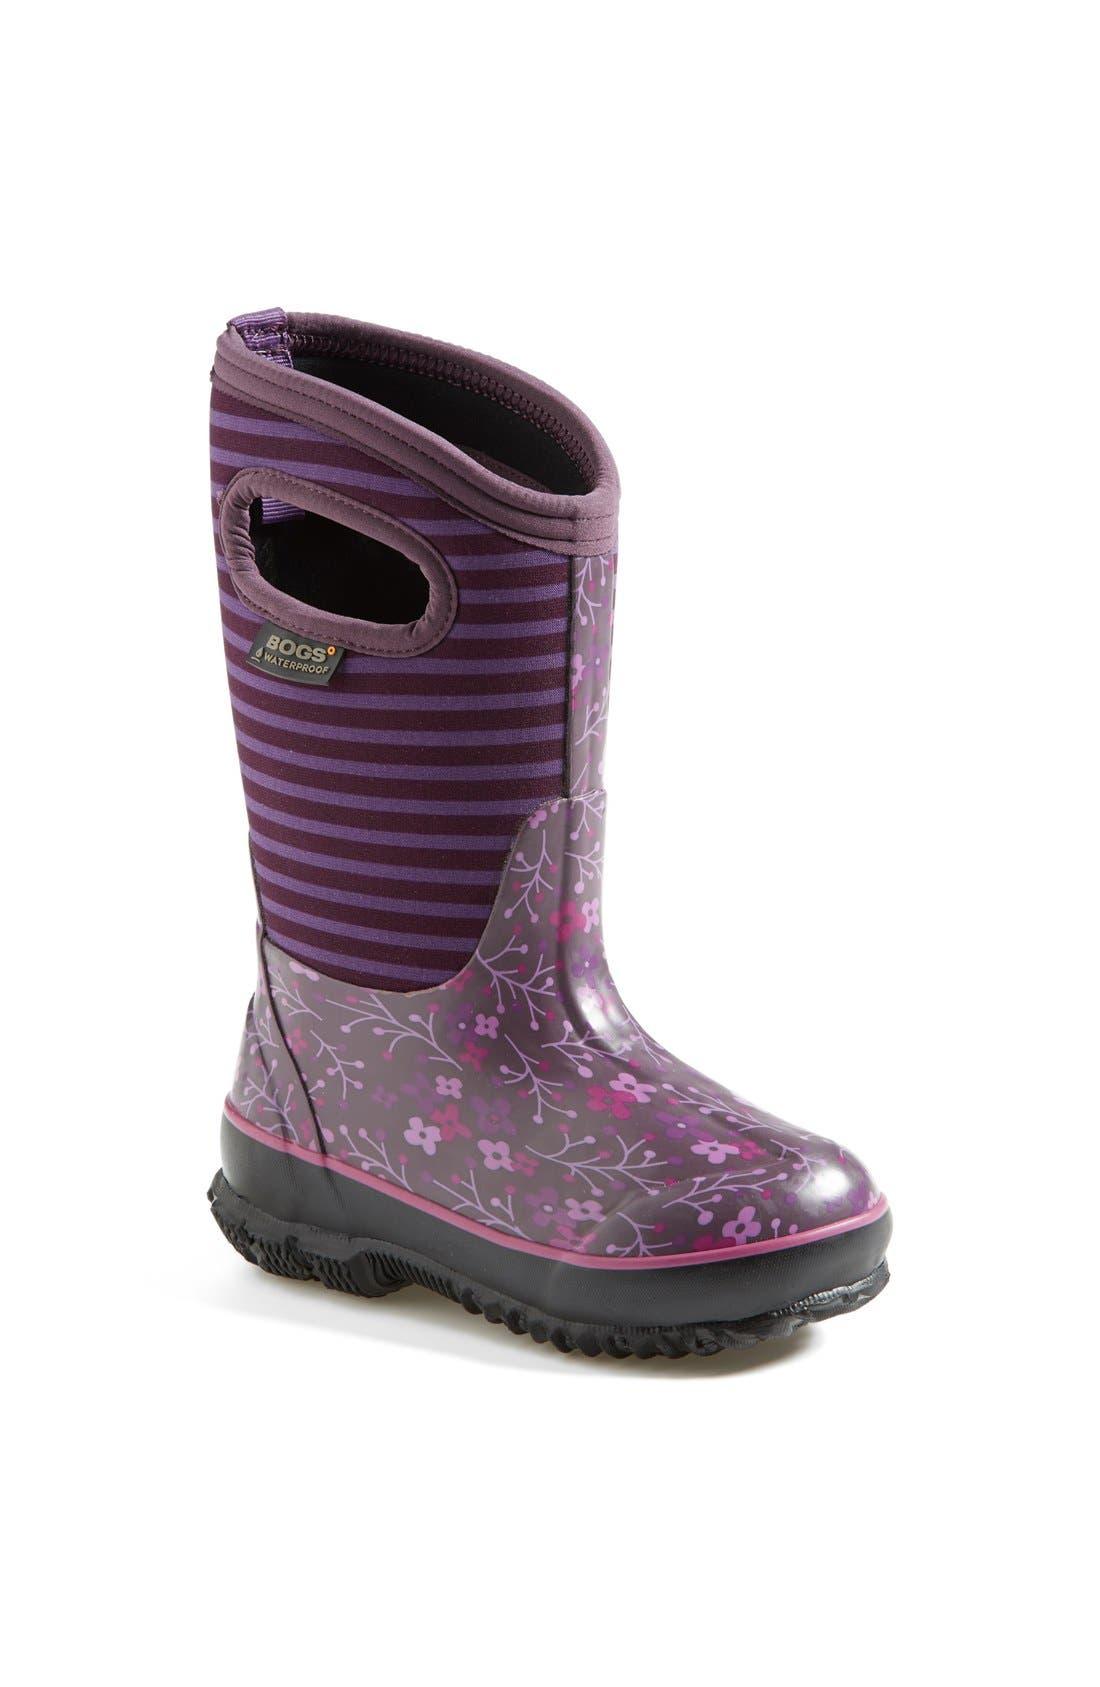 Main Image - Bogs 'Classic - Flower Stripe' Waterproof Boot (Little Kid & Big Kid)